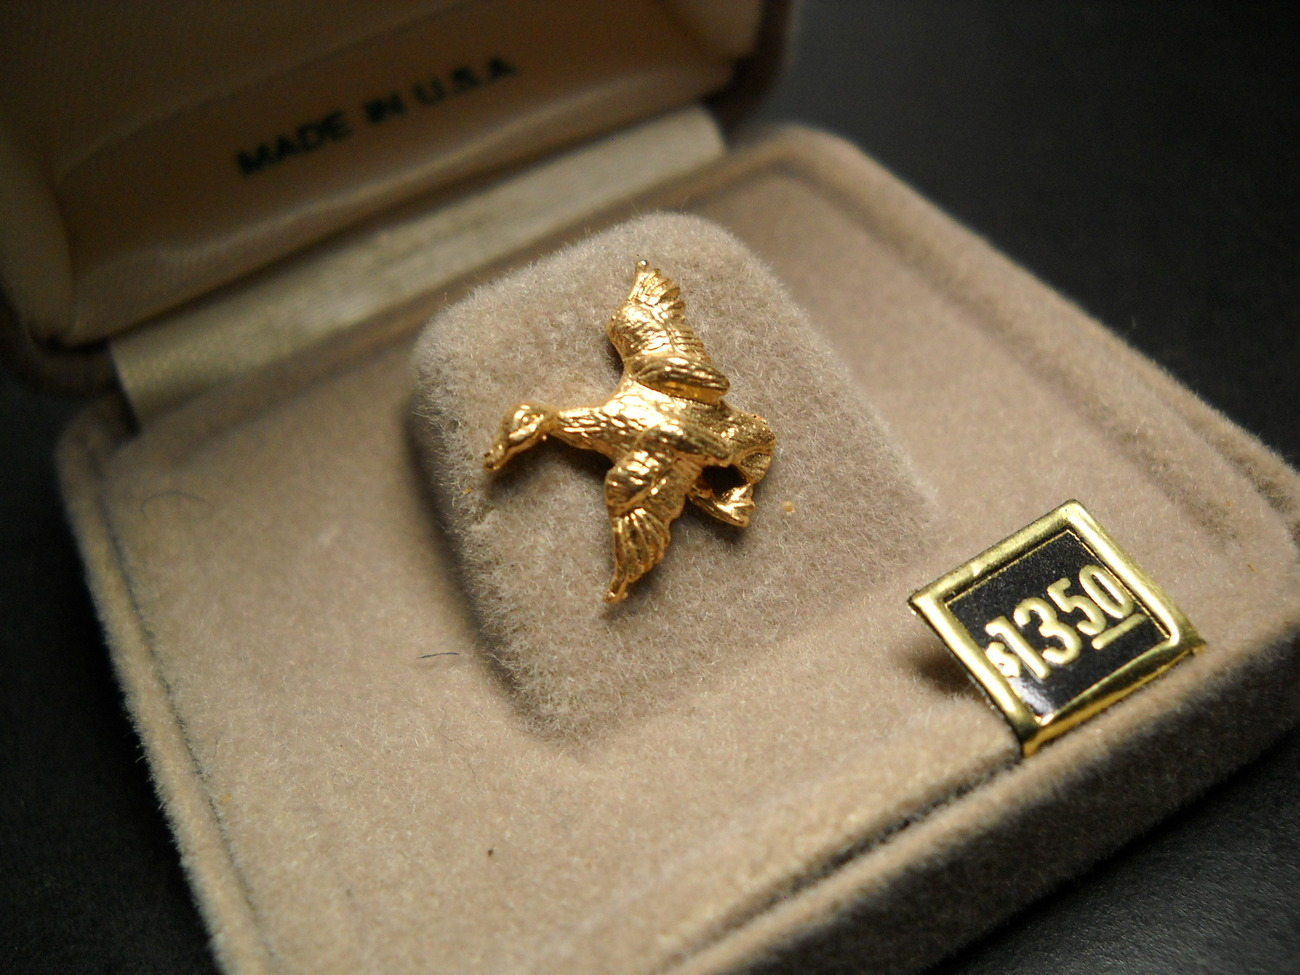 Anson Tie Tack Small Golden Duck in Flight Made in USA Original Presentation Box - $12.99